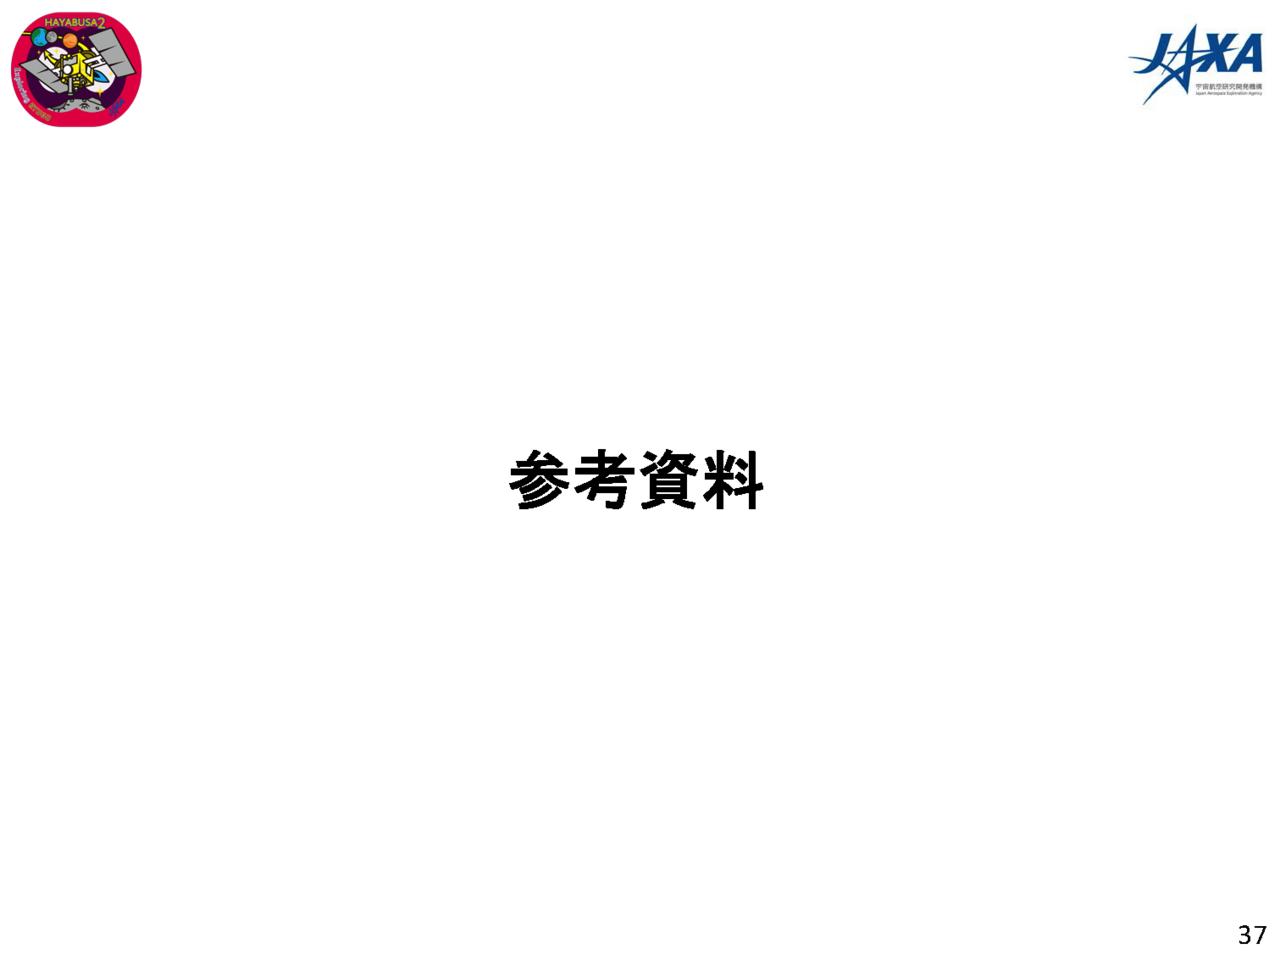 f:id:Imamura:20180802145957p:plain